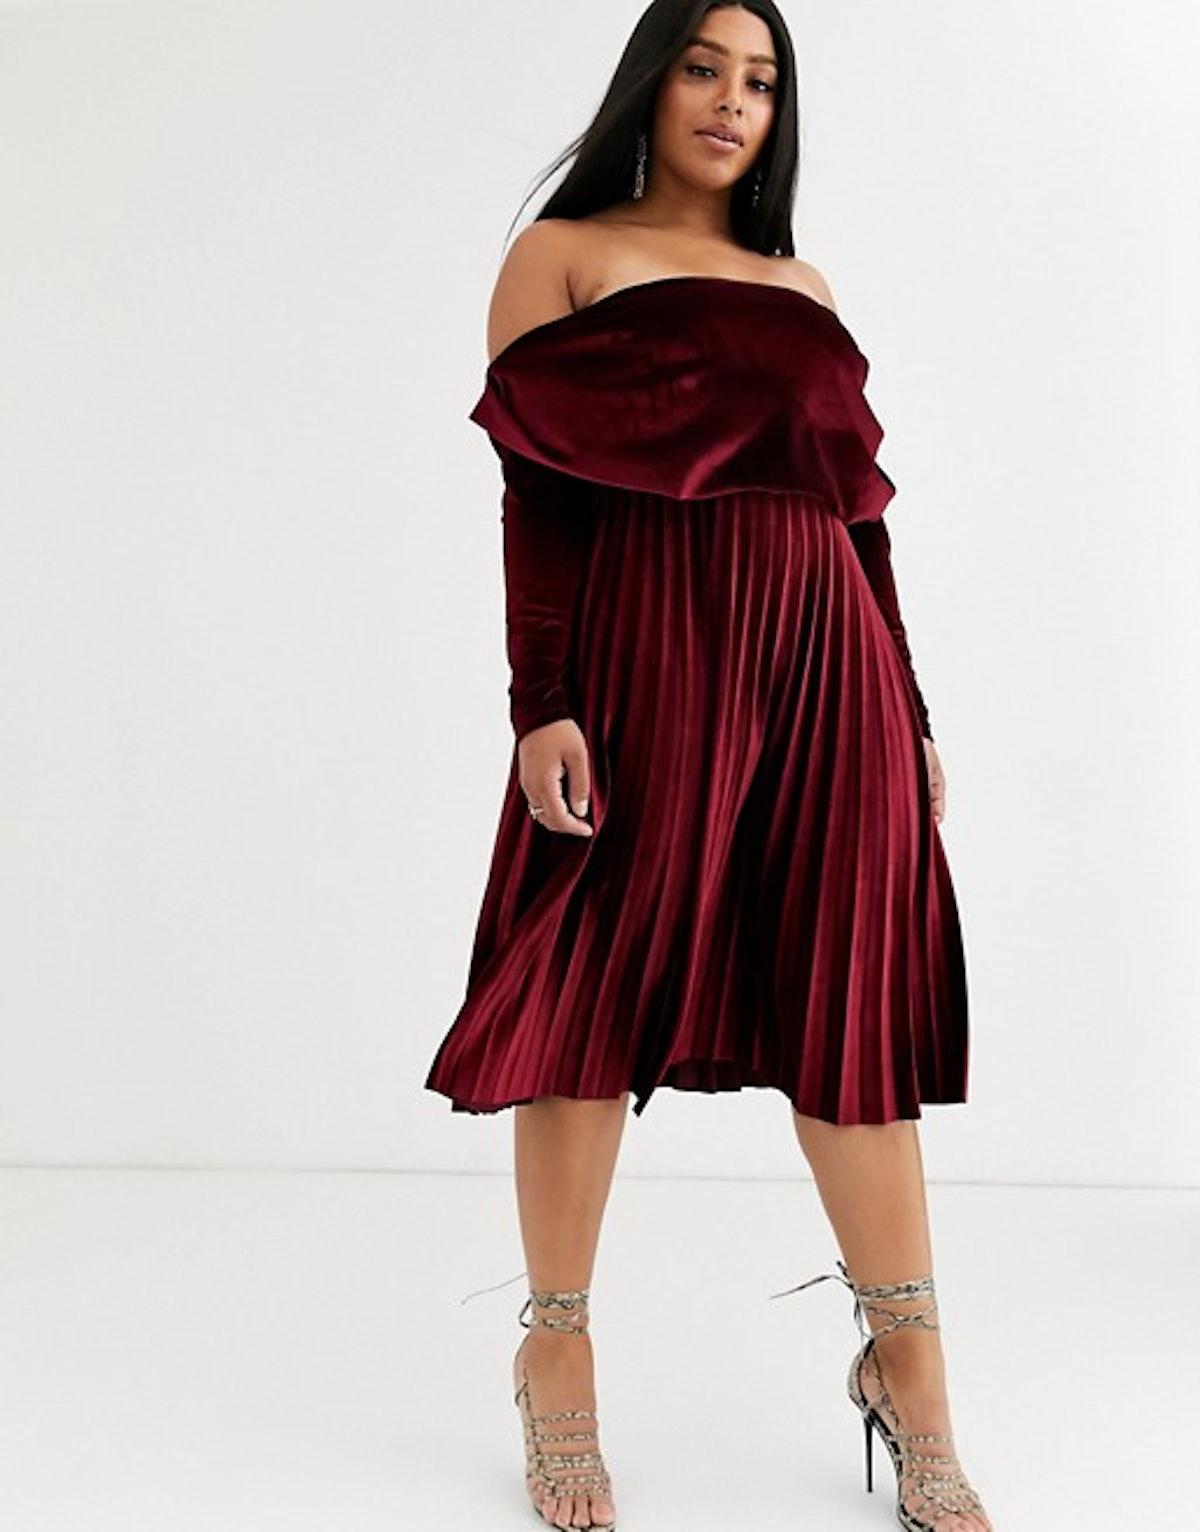 ASOS DESIGN Curve Velvet Long Sleeve Bardot Pleated Midi Dress in Oxblood